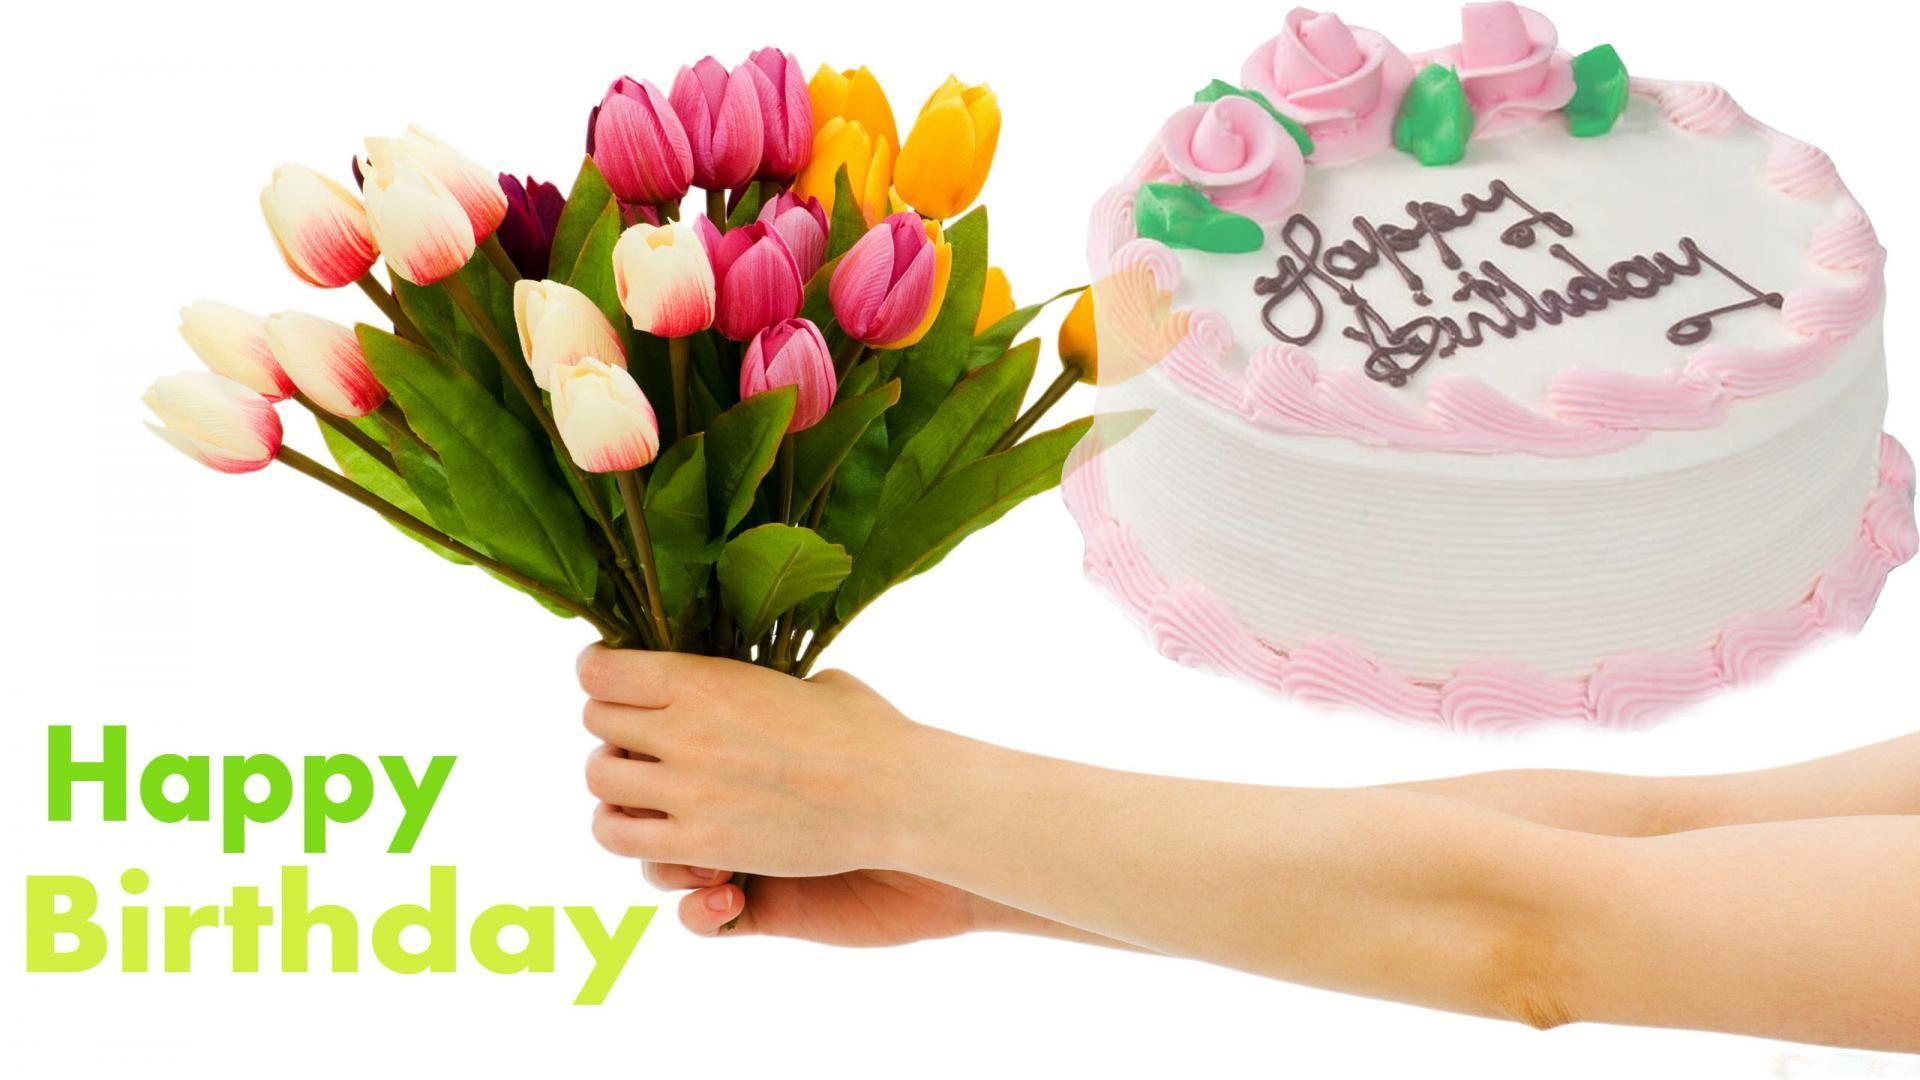 Happy birthday flower photos good morning pinterest happy happy birthday flower photos izmirmasajfo Gallery